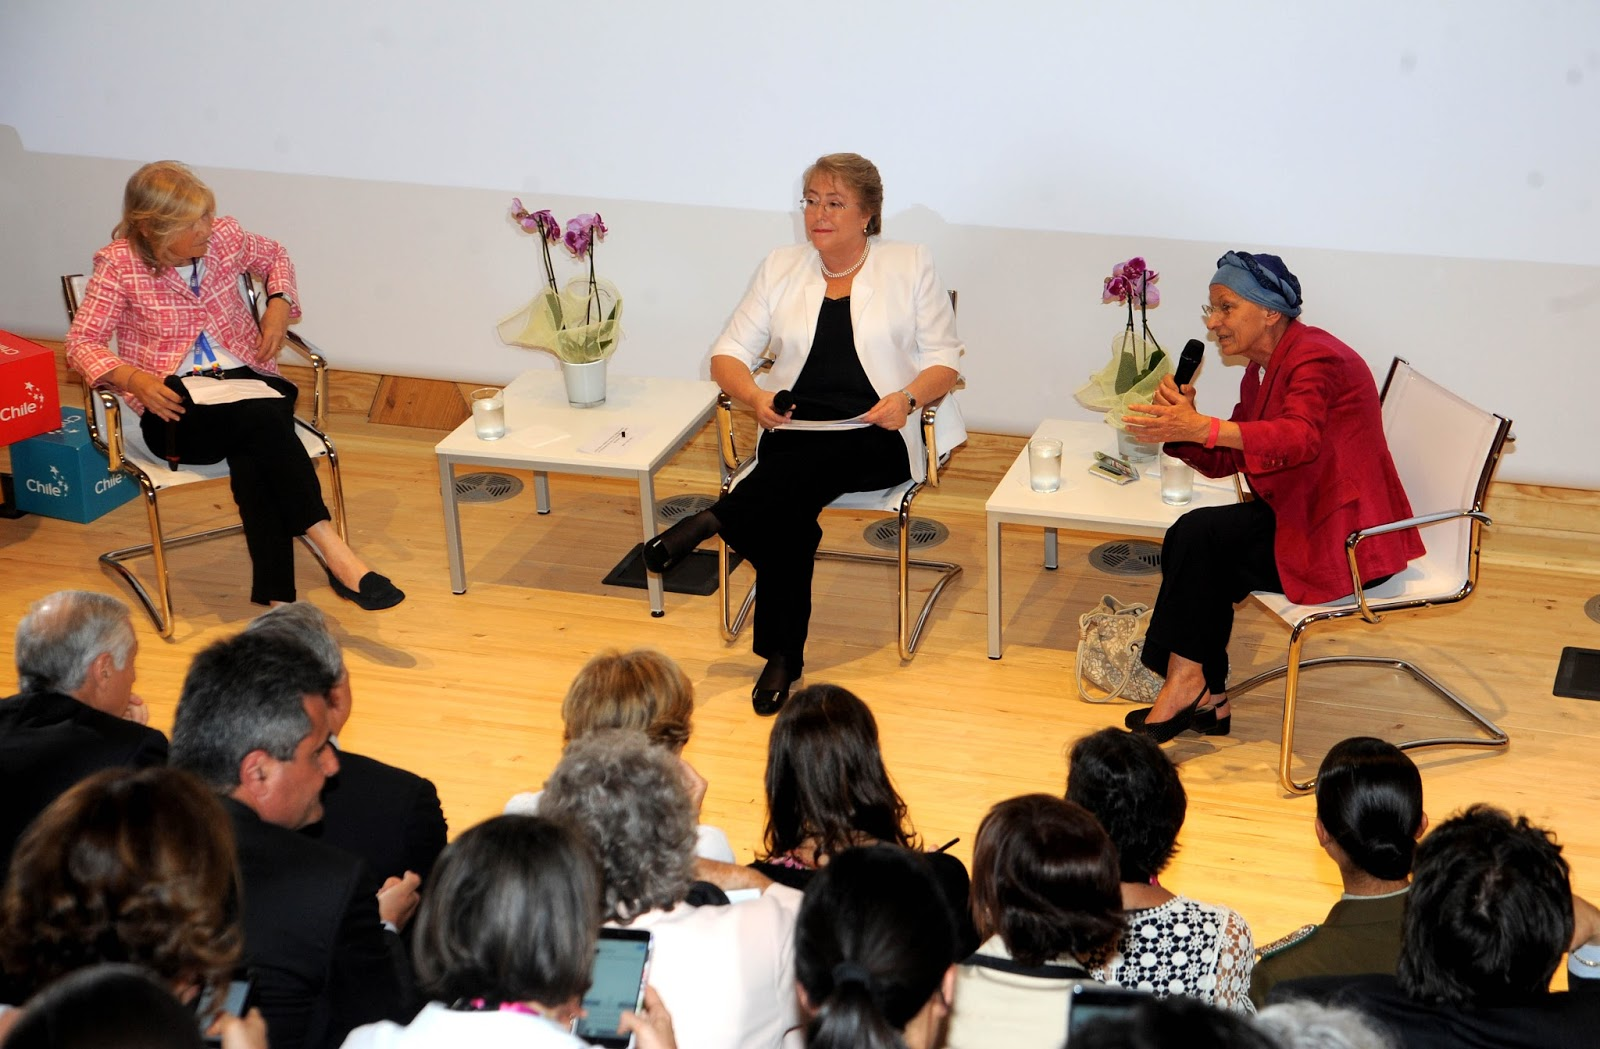 Bachelet-e-la-Bonino-a-Expo-2015-per-la-fame-nel-mondo